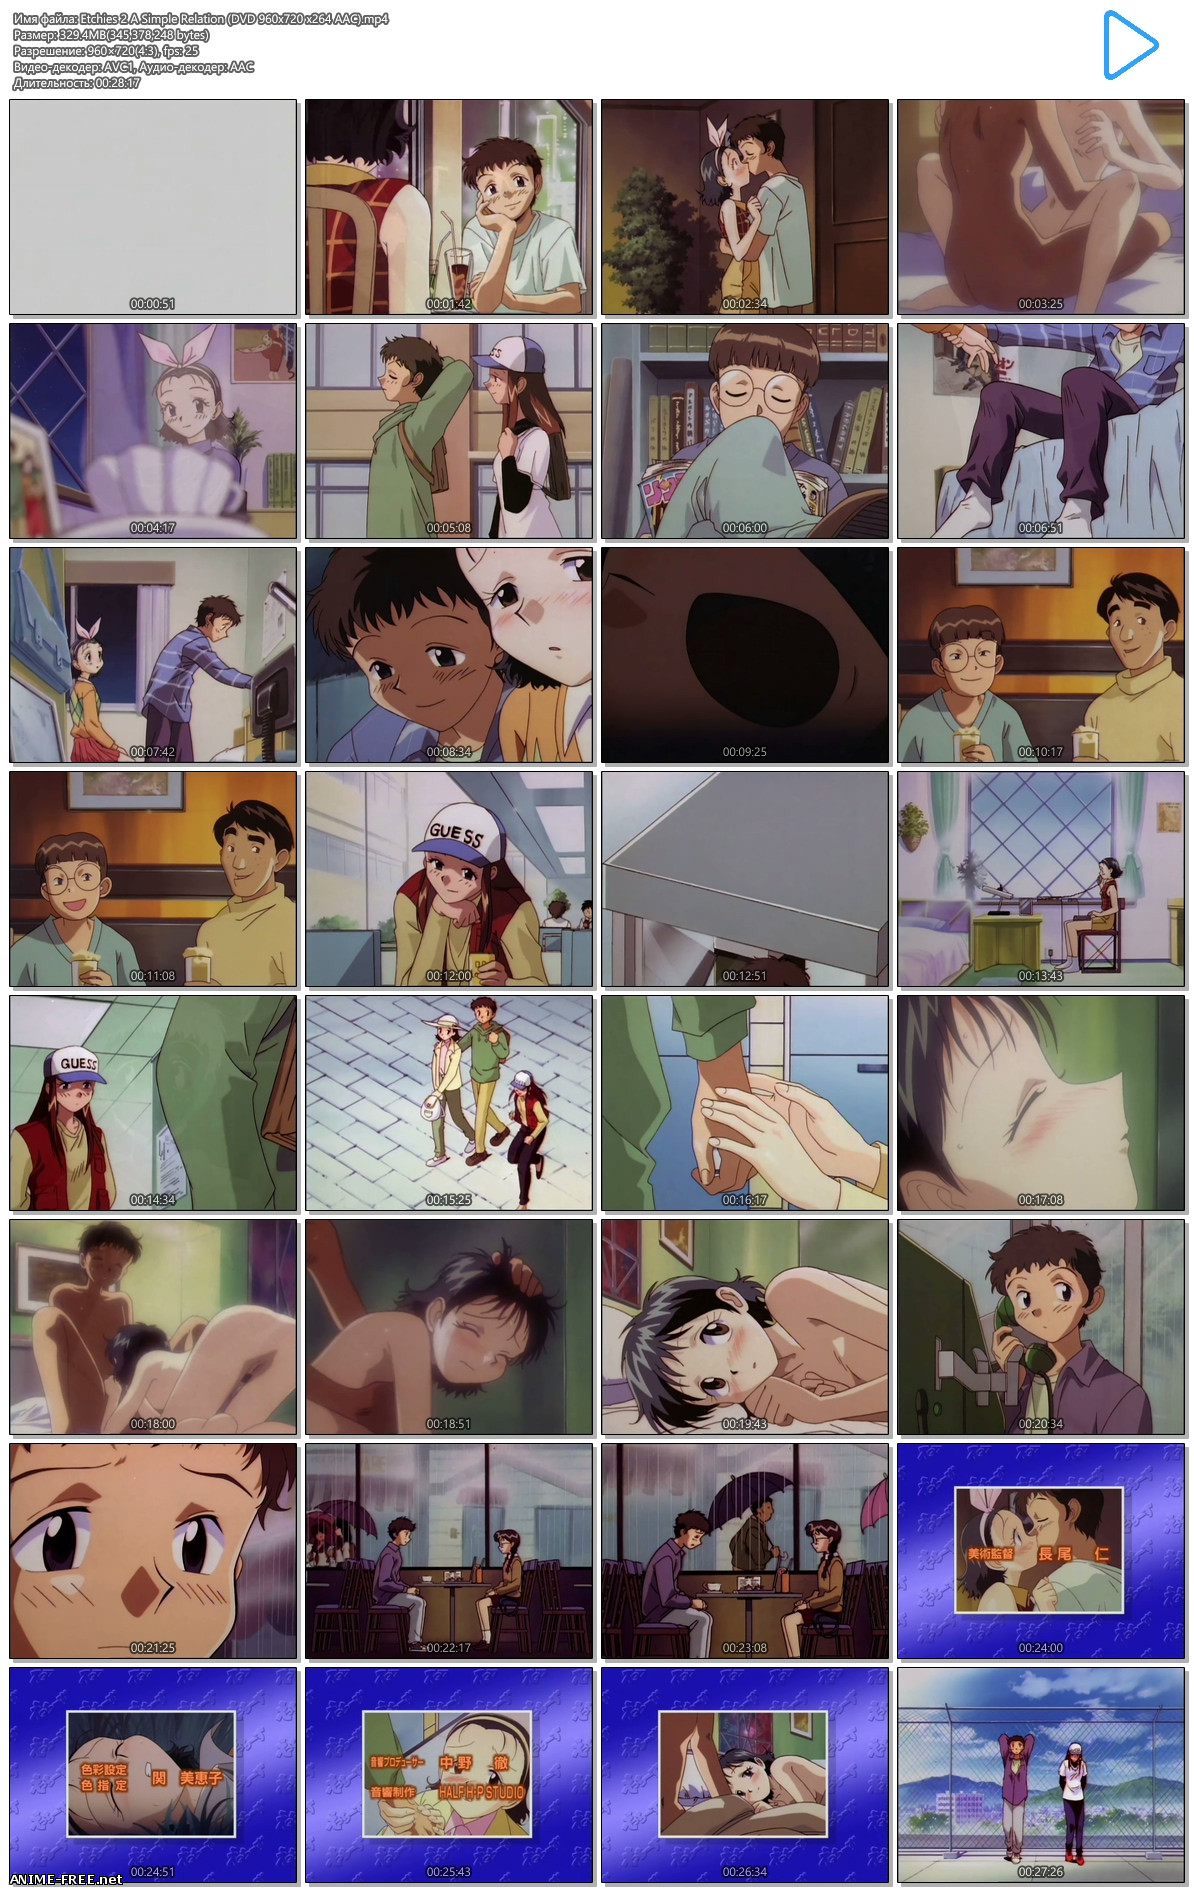 Ecchies / Фривольности [Ep.1-2] [RUS,ENG,JAP] [720p] Anime Hentai